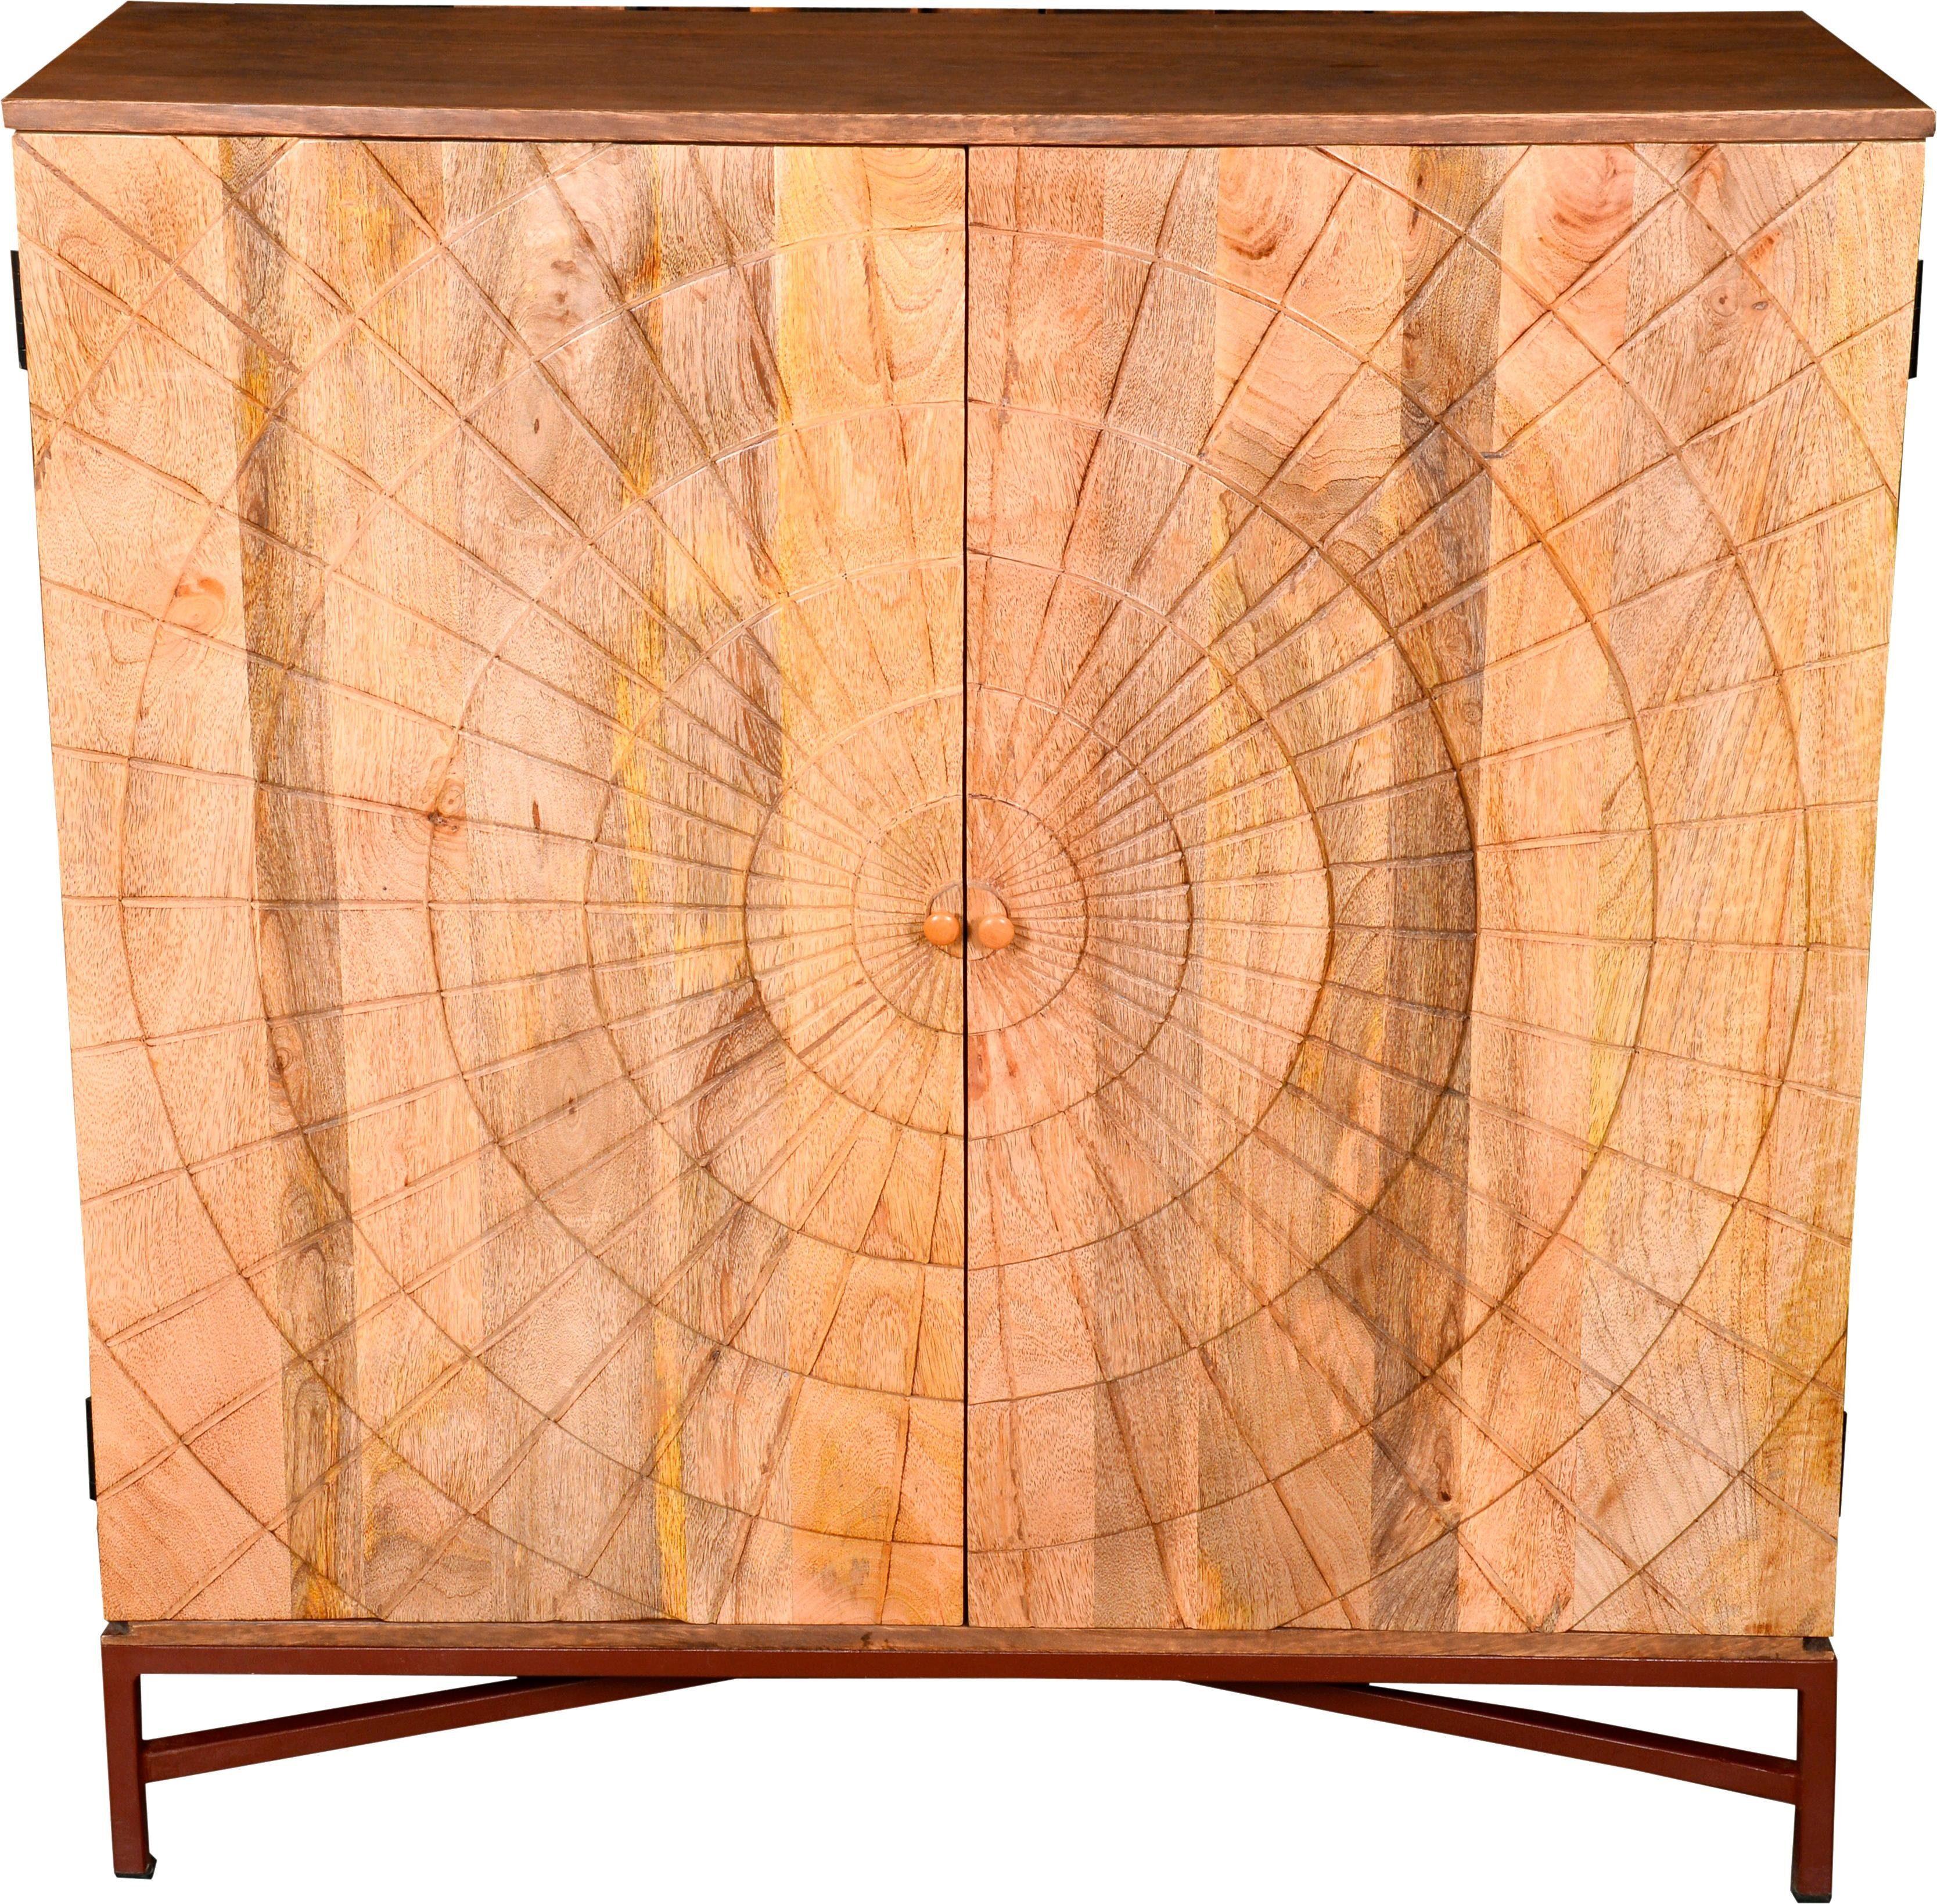 The Wood Times Weinschrank »Sunny«, Breite 95 cm